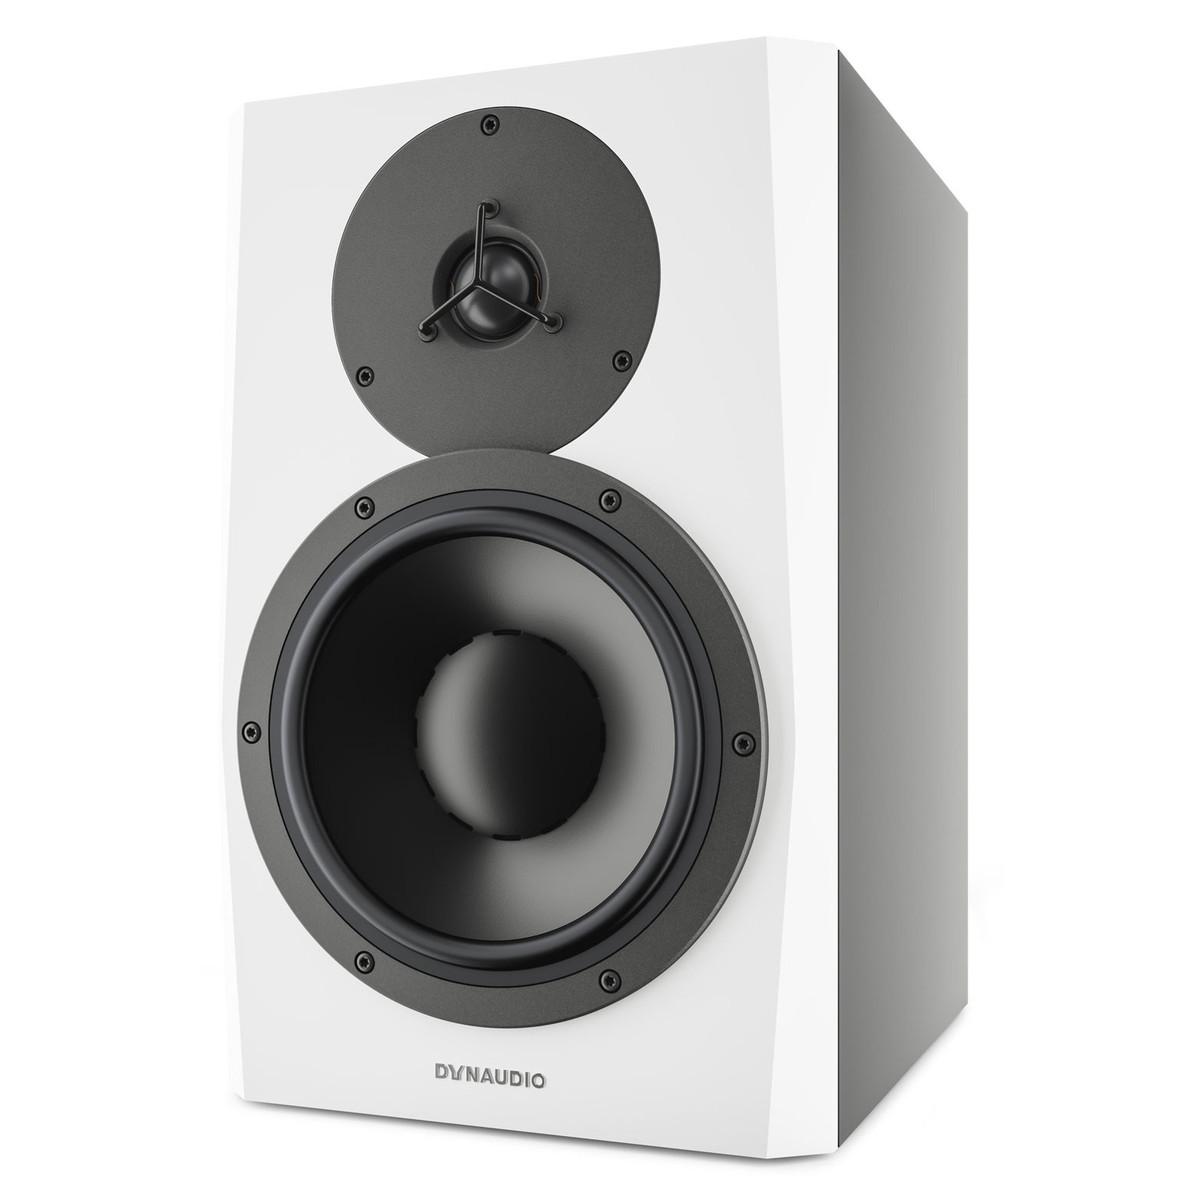 dynaudio lyd 8 near field studio monitor single at gear4music. Black Bedroom Furniture Sets. Home Design Ideas